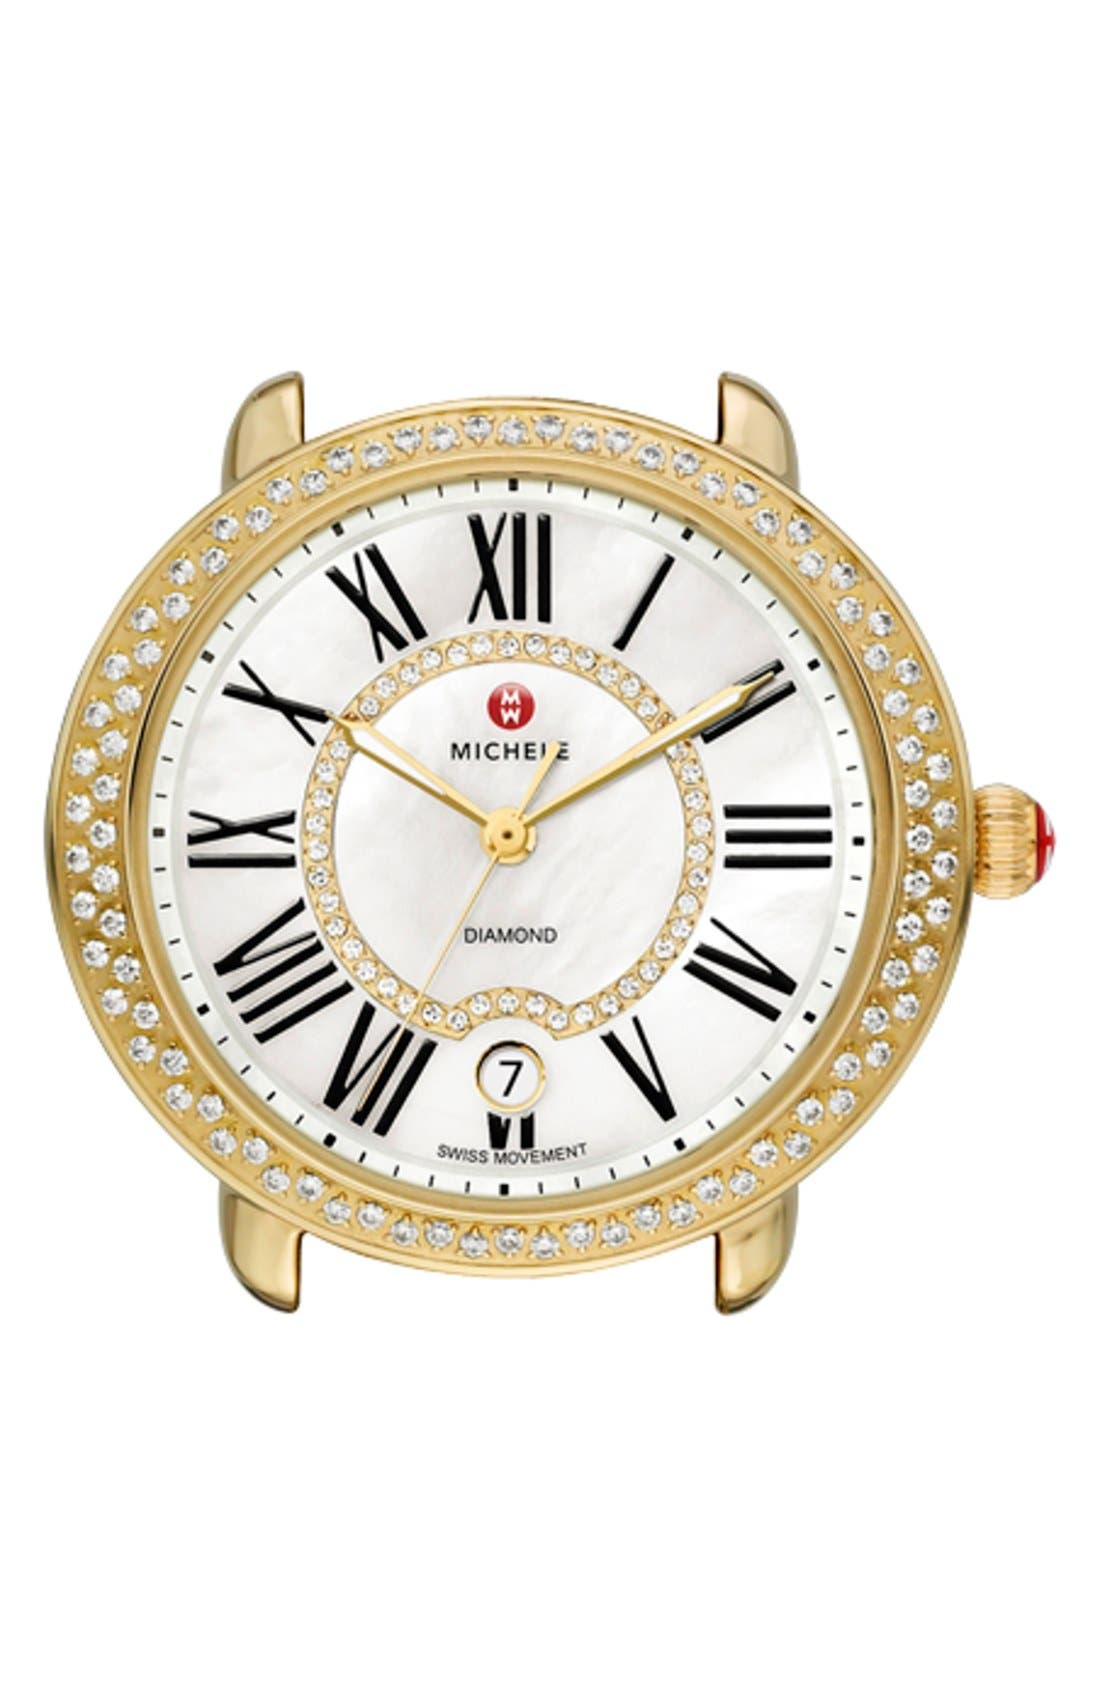 MICHELE Serein 16 Diamond Gold Plated Watch Case, 34mm x 36mm